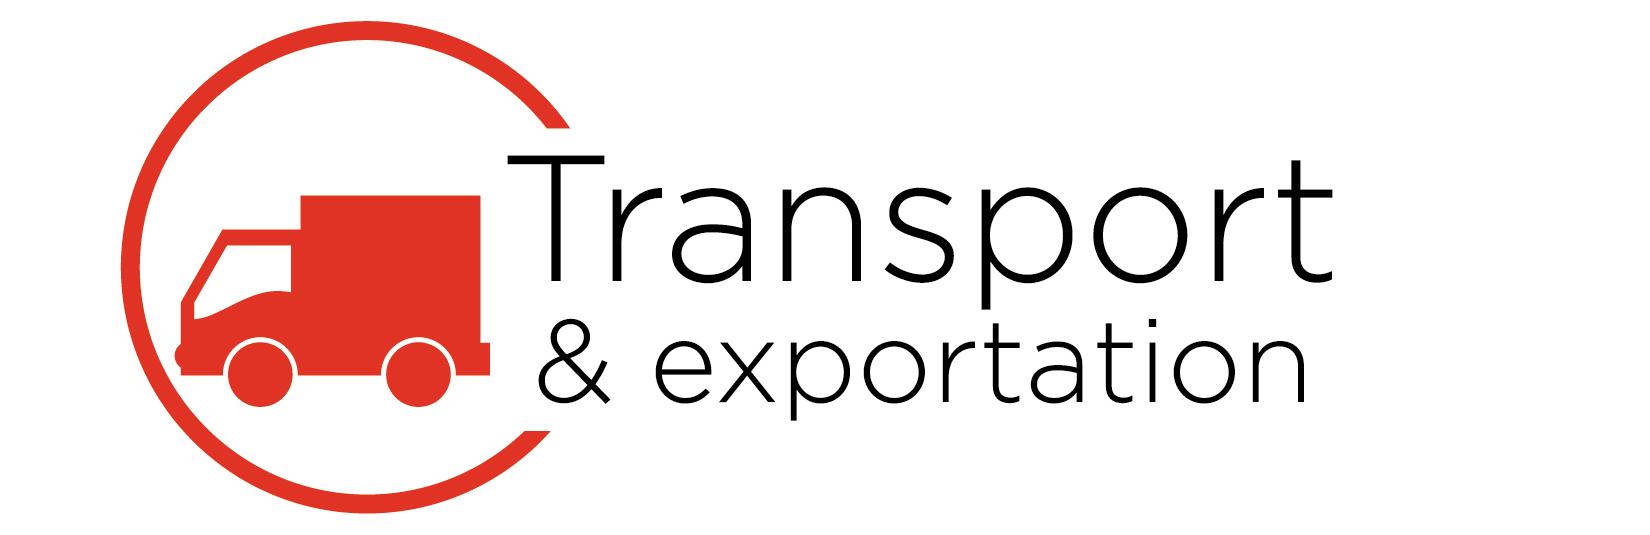 Icone_Transport